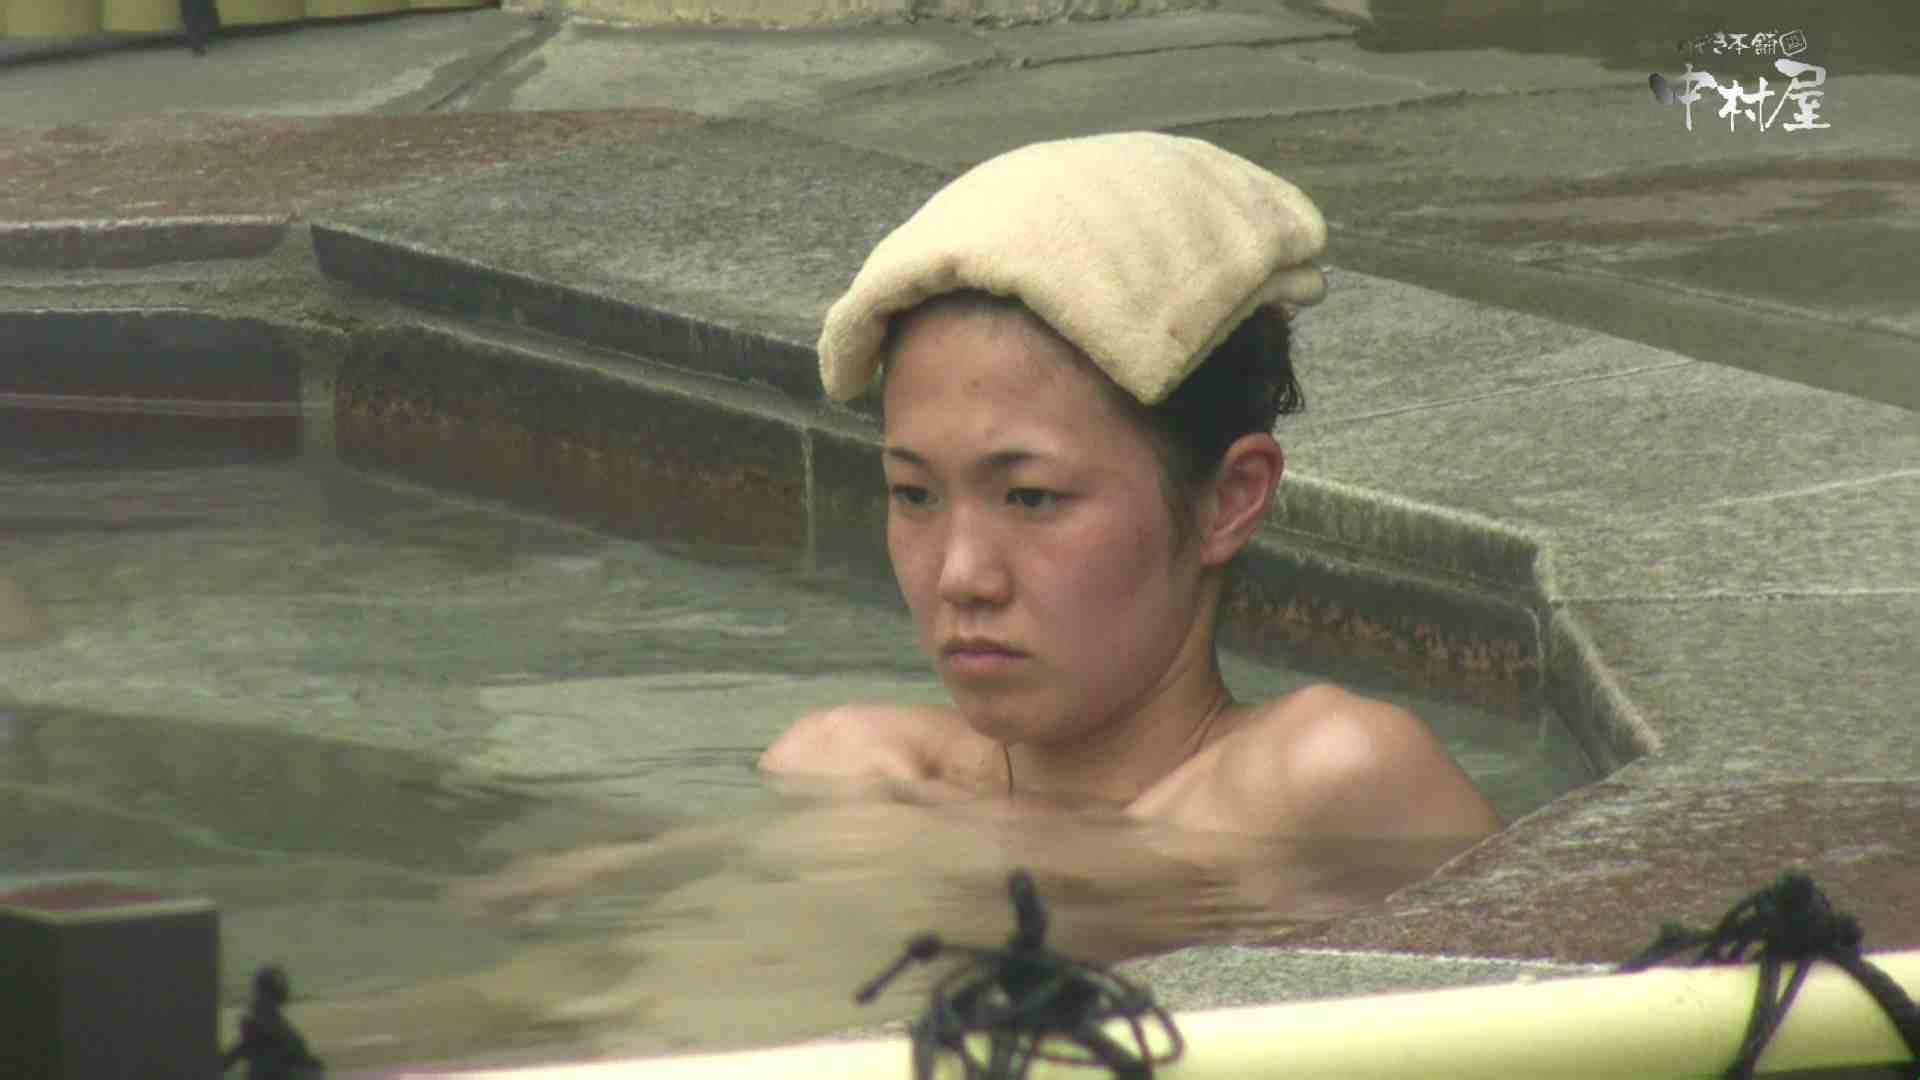 Aquaな露天風呂Vol.889 0   0  87連発 85